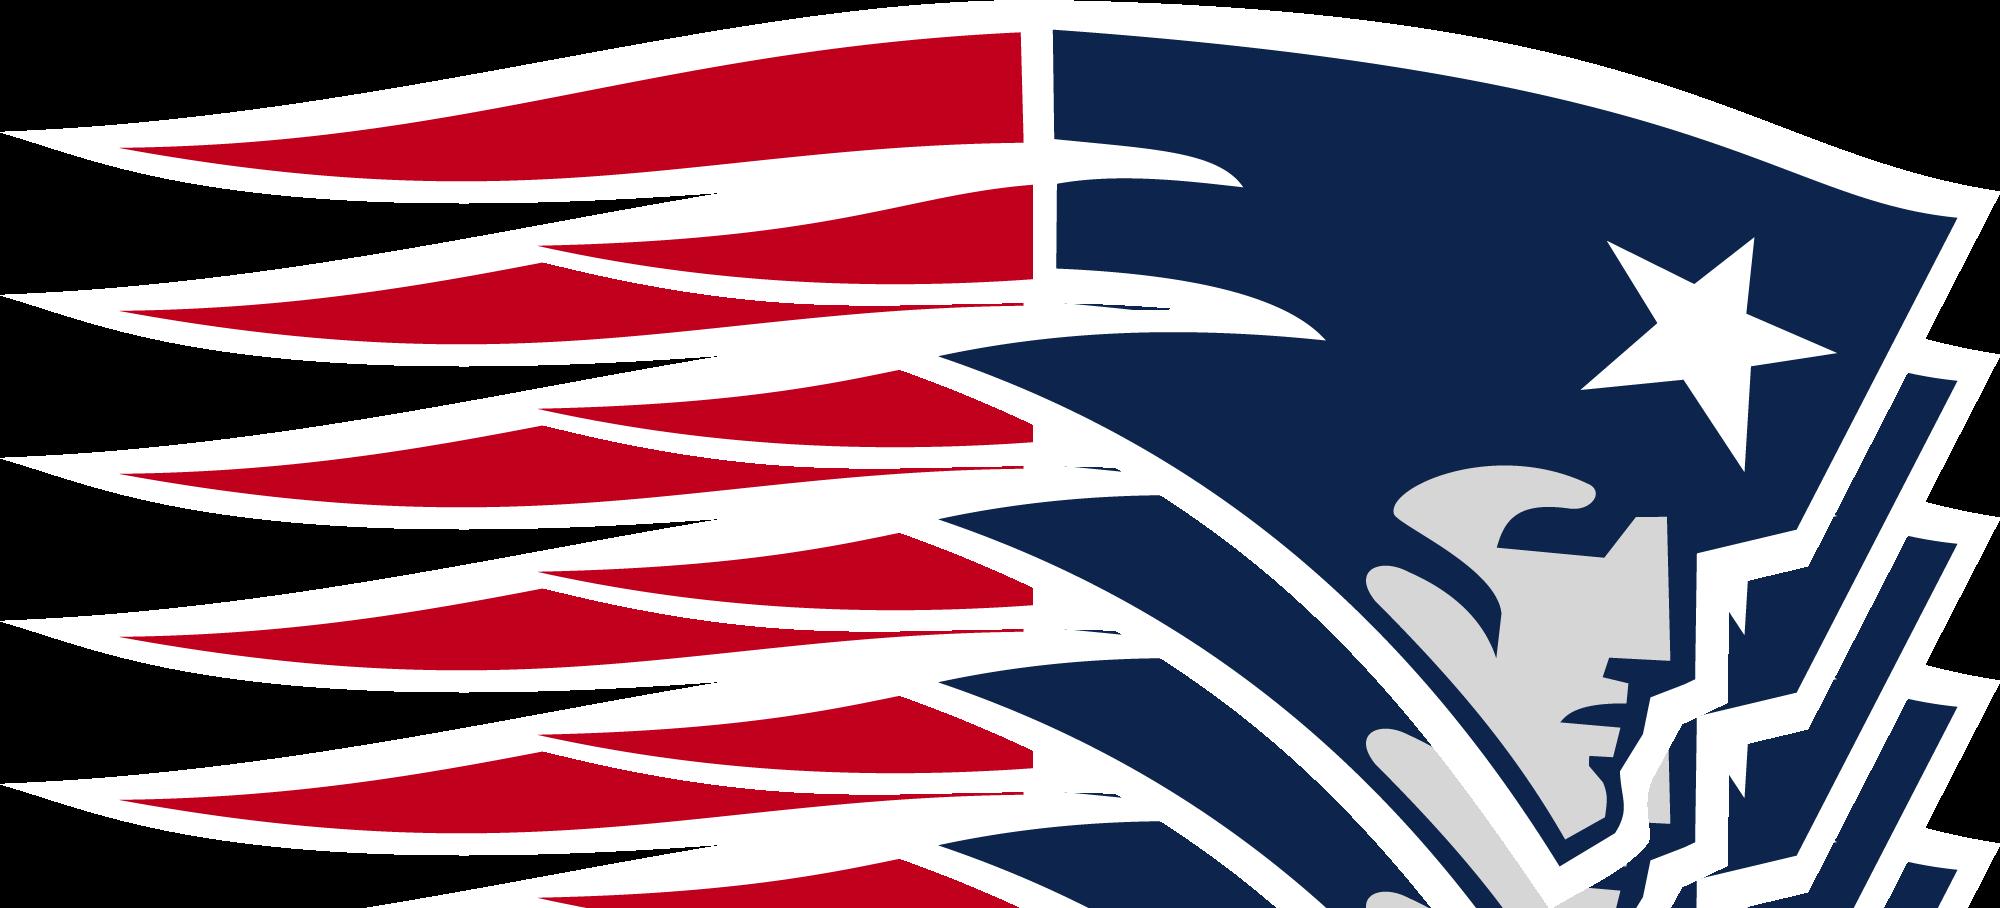 NE Patriots Logo Wallpaper - WallpaperSafari